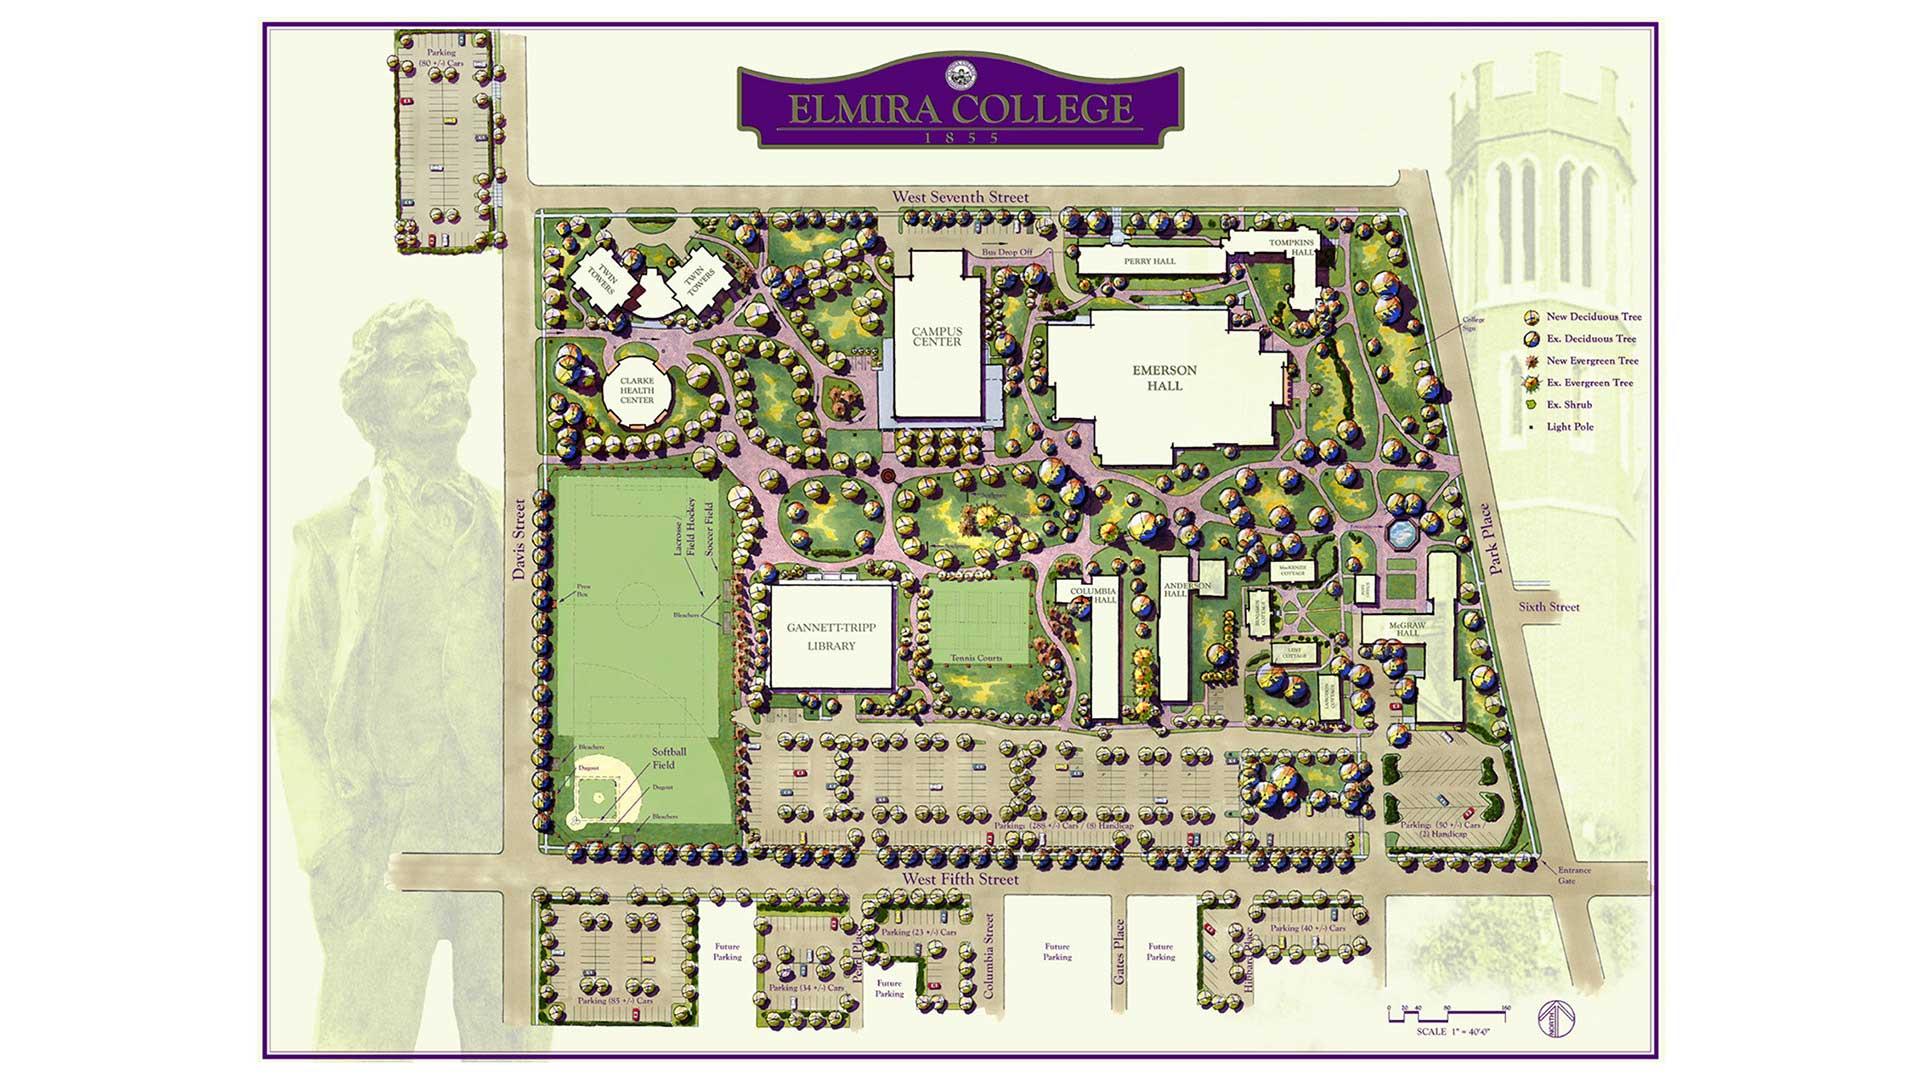 Elmira College Campus Master Plan